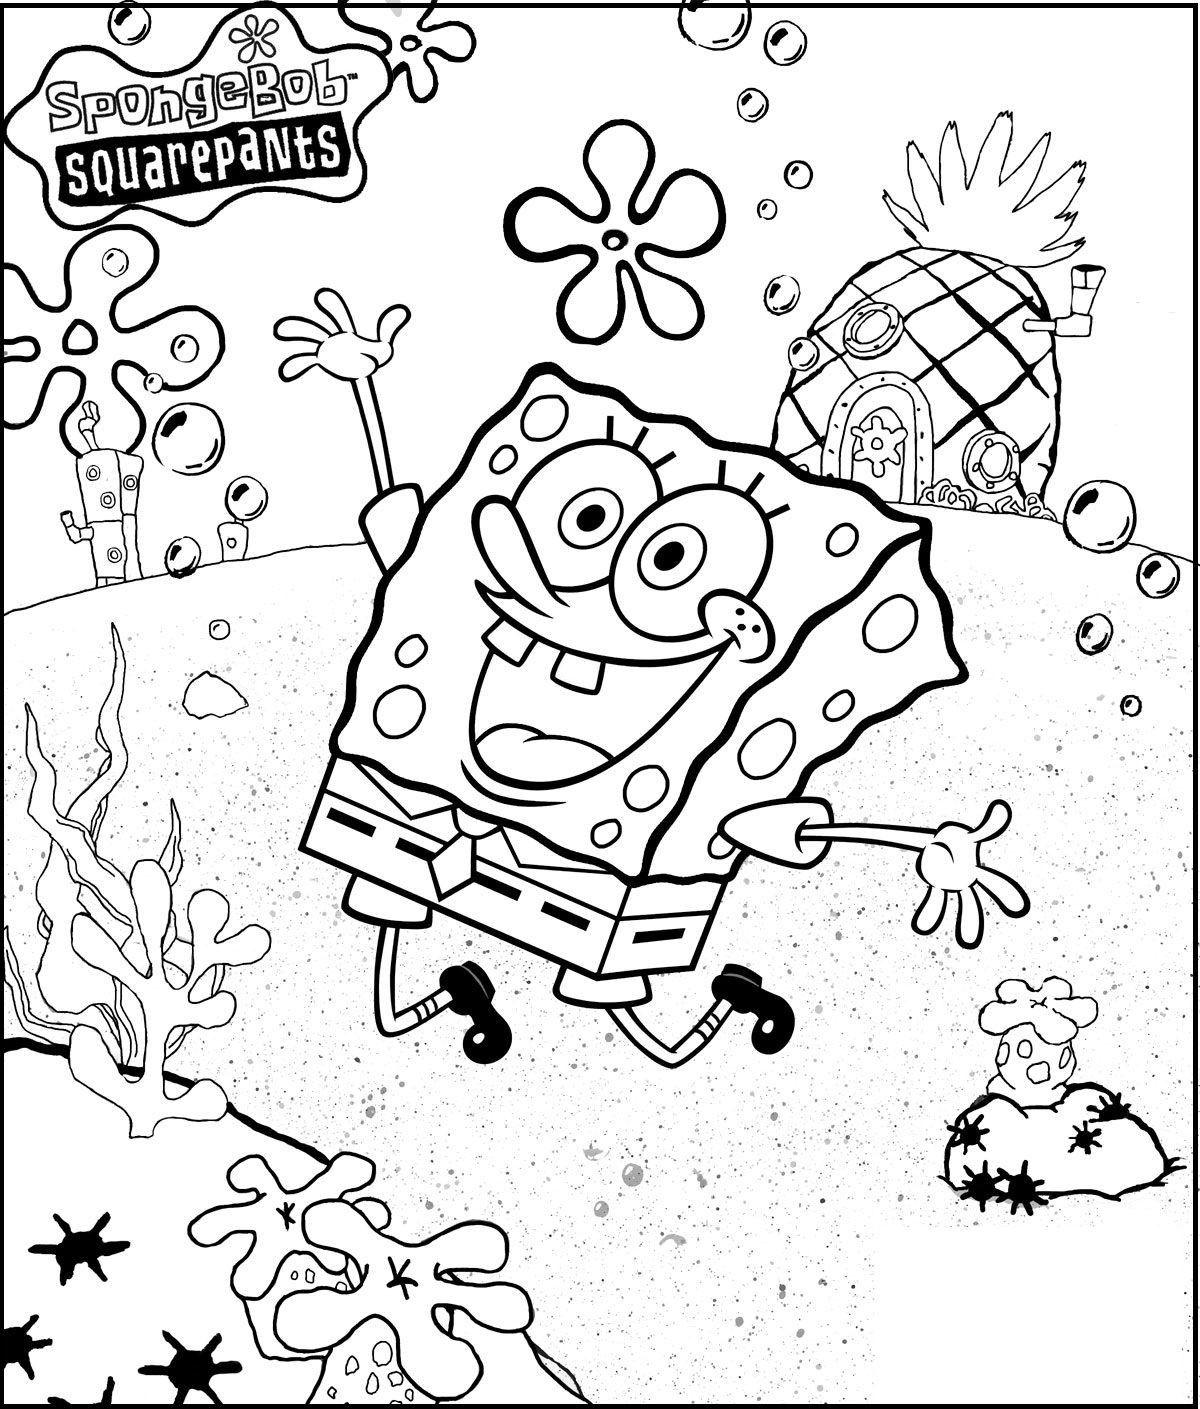 Spongebob Face Coloring Pages Through The Thousands Of Photographs On Line Regarding Spongebob Face Cartoon Coloring Pages Spongebob Coloring Coloring Books